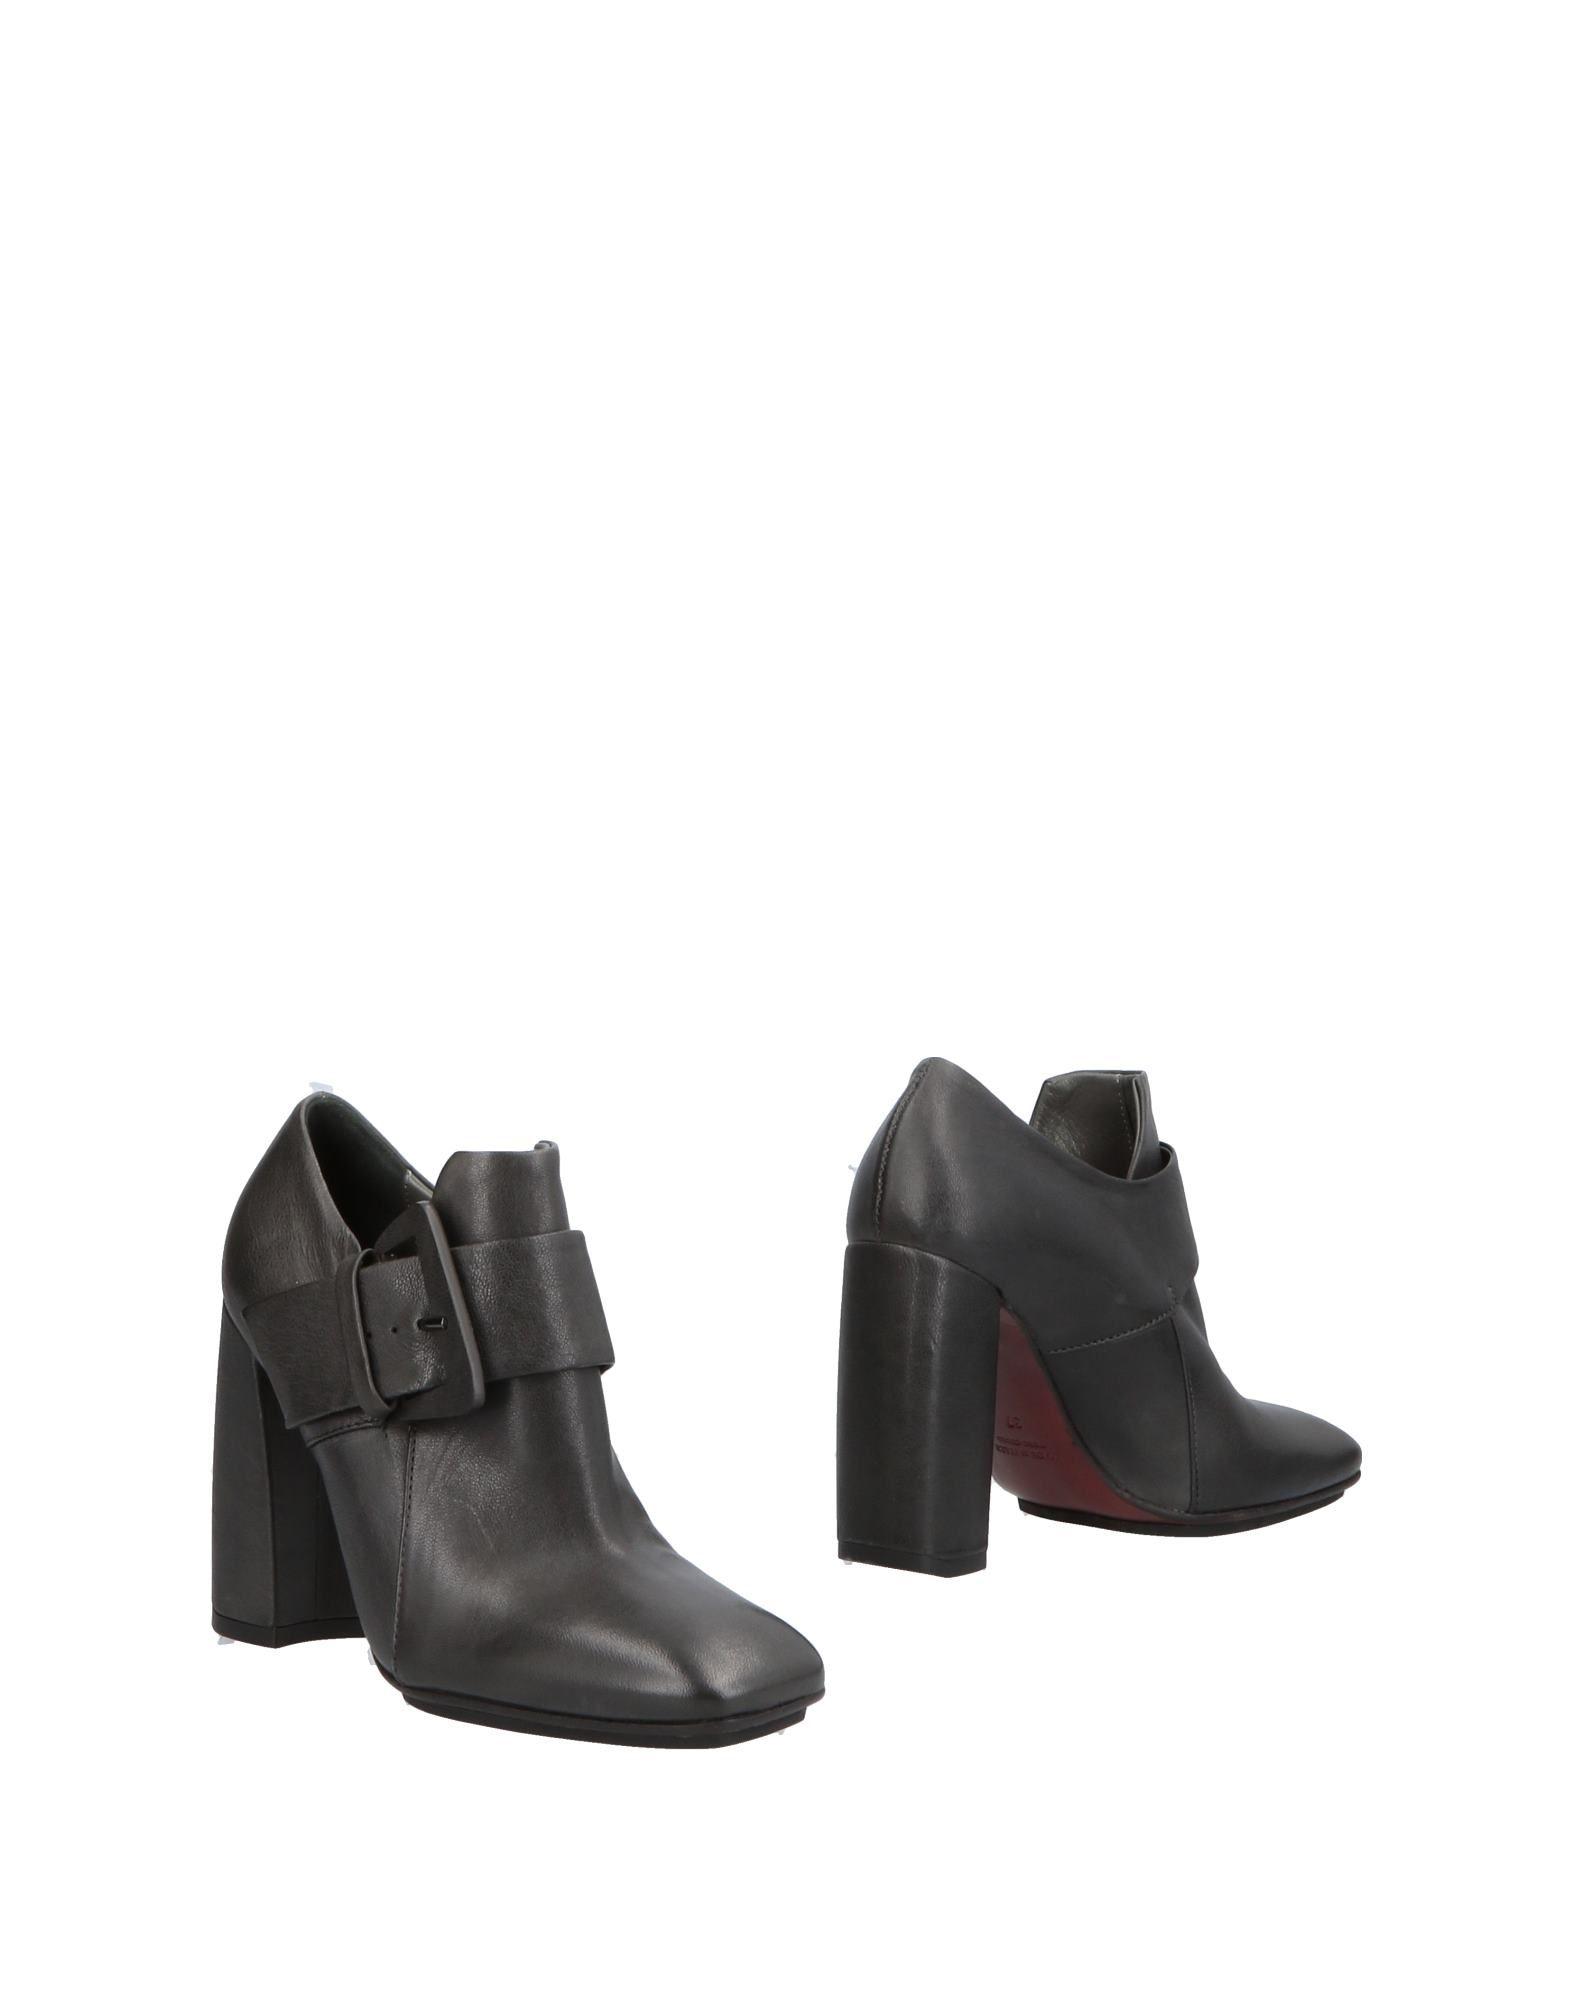 Ixos Stiefelette Damen Heiße  11504014LG Heiße Damen Schuhe 8a02eb